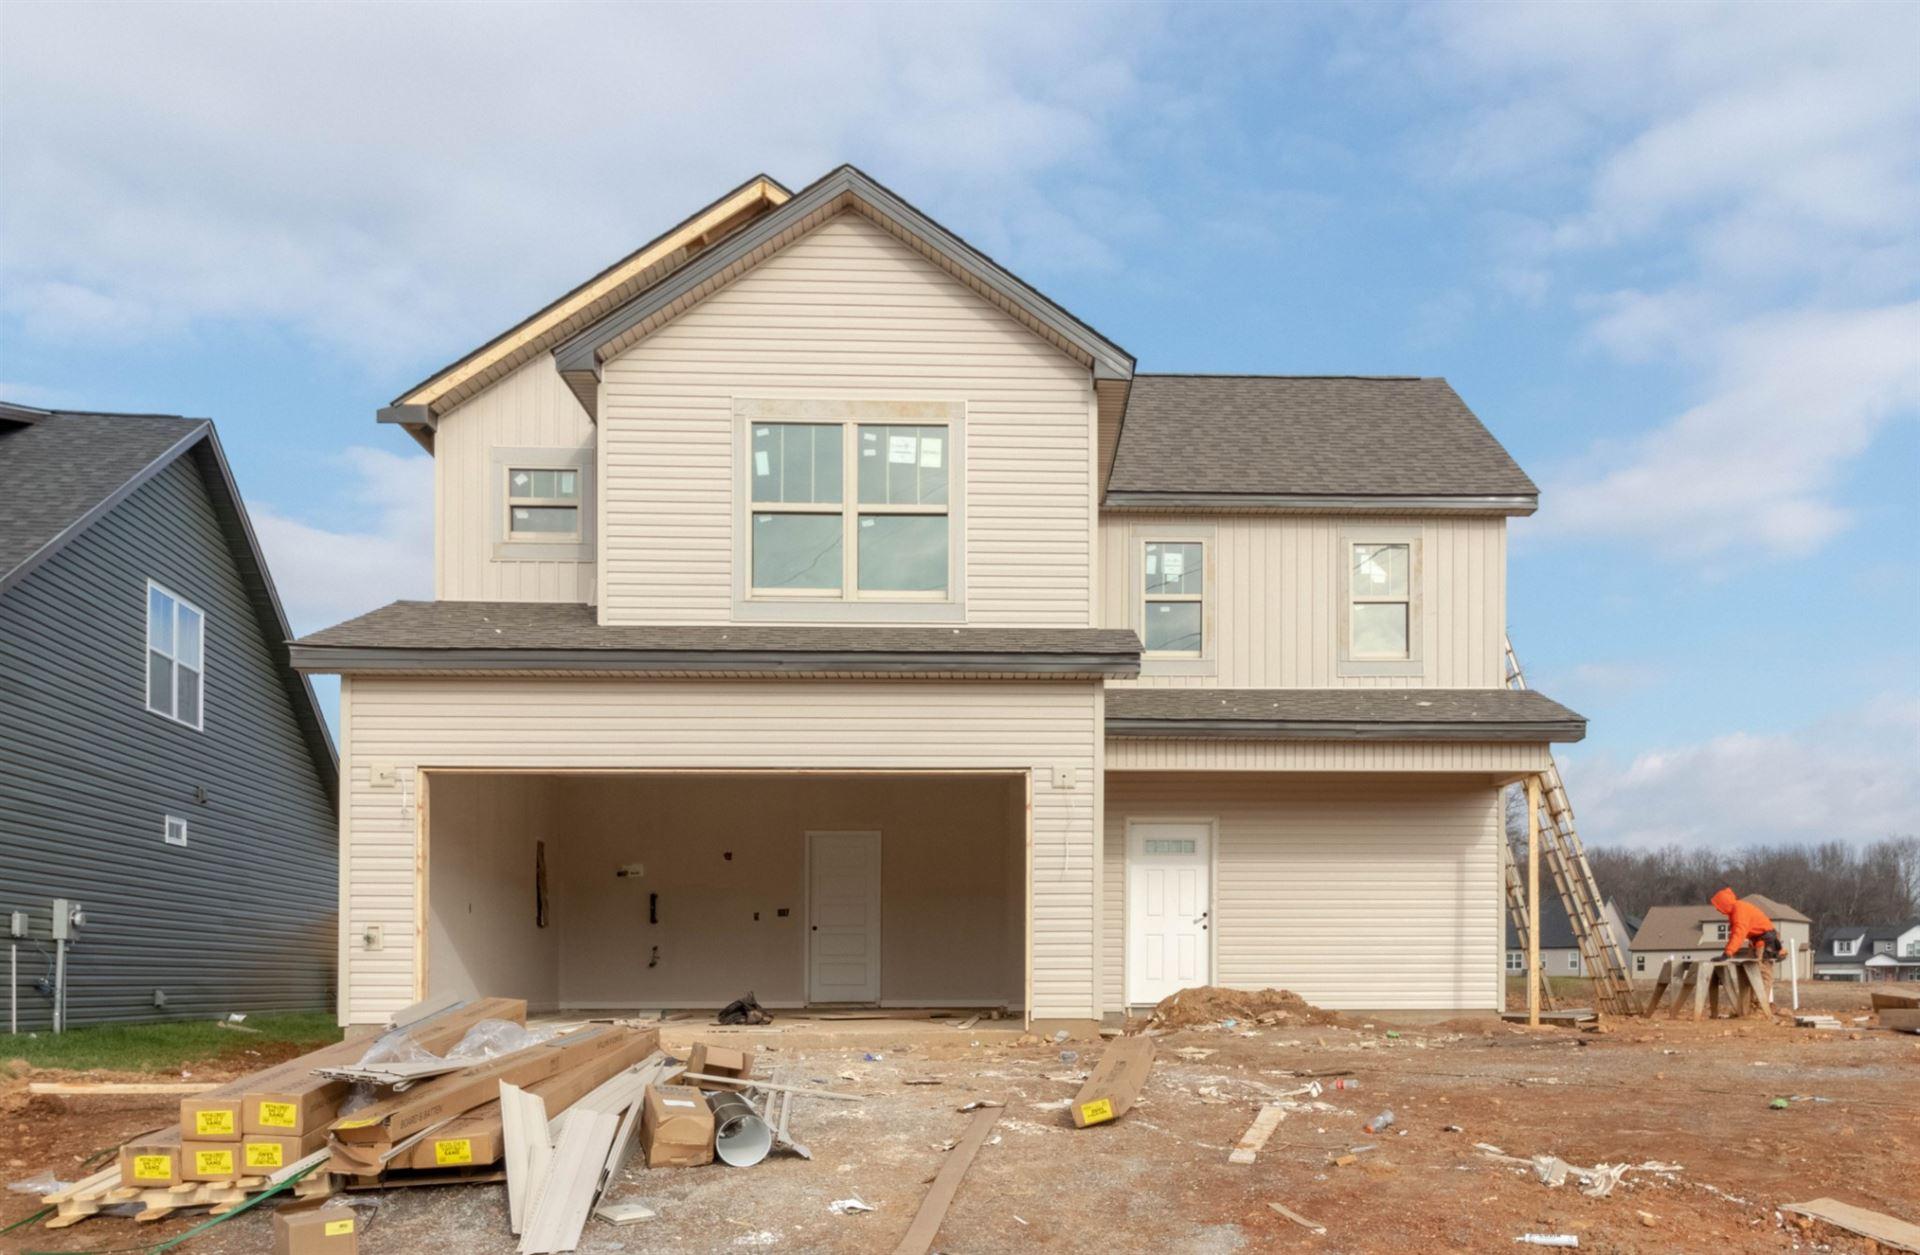 291 Eagles Bluff, Clarksville, TN 37040 - MLS#: 2200020